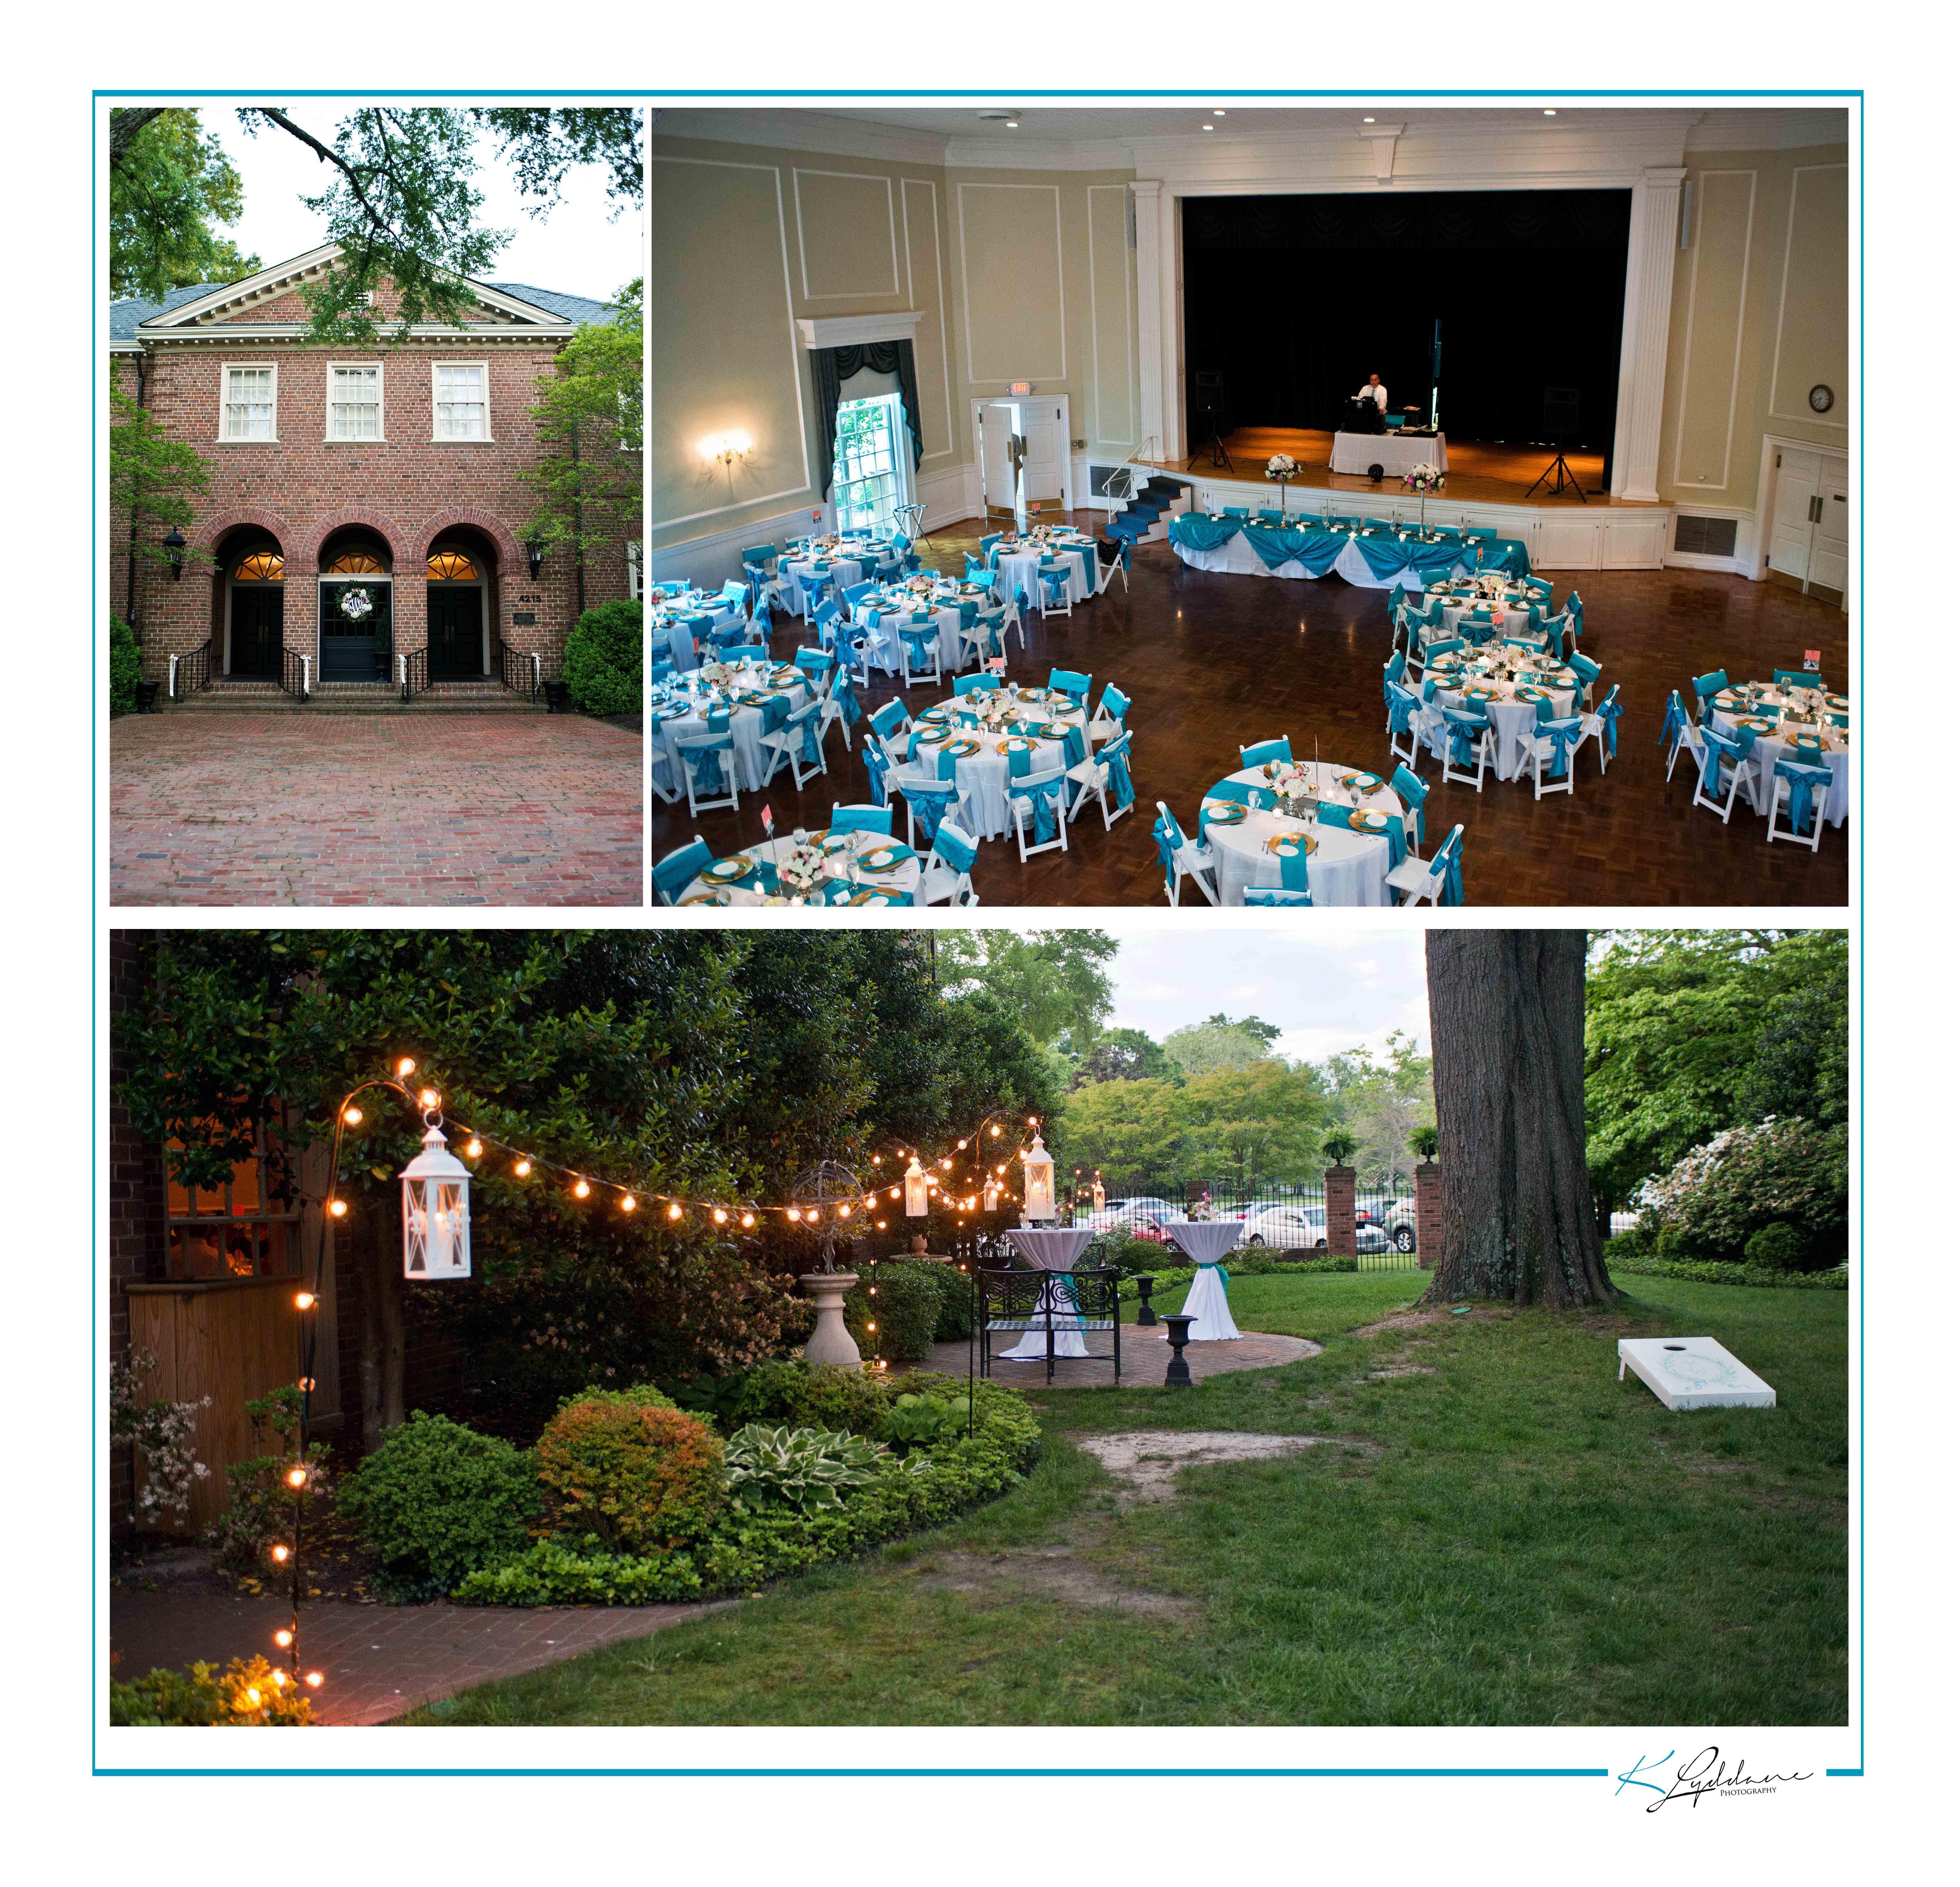 Party Halls In Richmond Va: Tuckahoe Woman's Club, Richmond VA, Kimberly Lyddane